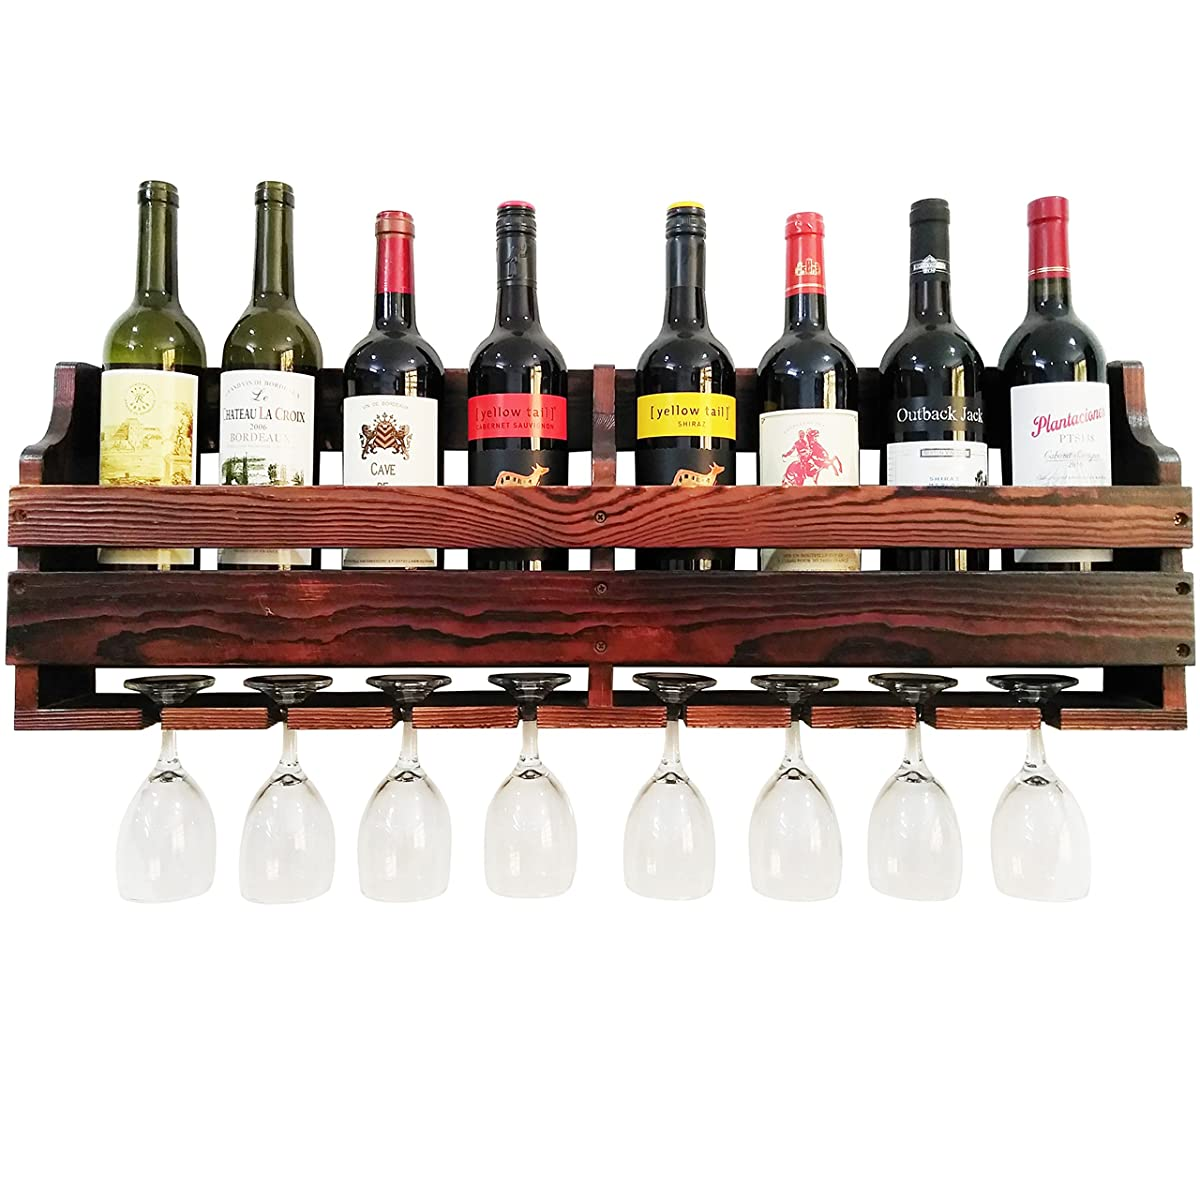 TUORUI Wine Rack Wall Mounted,Wine Glass & Wine Bottle Display Rack,pine wood,8 Bottle 8 Long Stem Glass Holder(Charcoal walnut color)